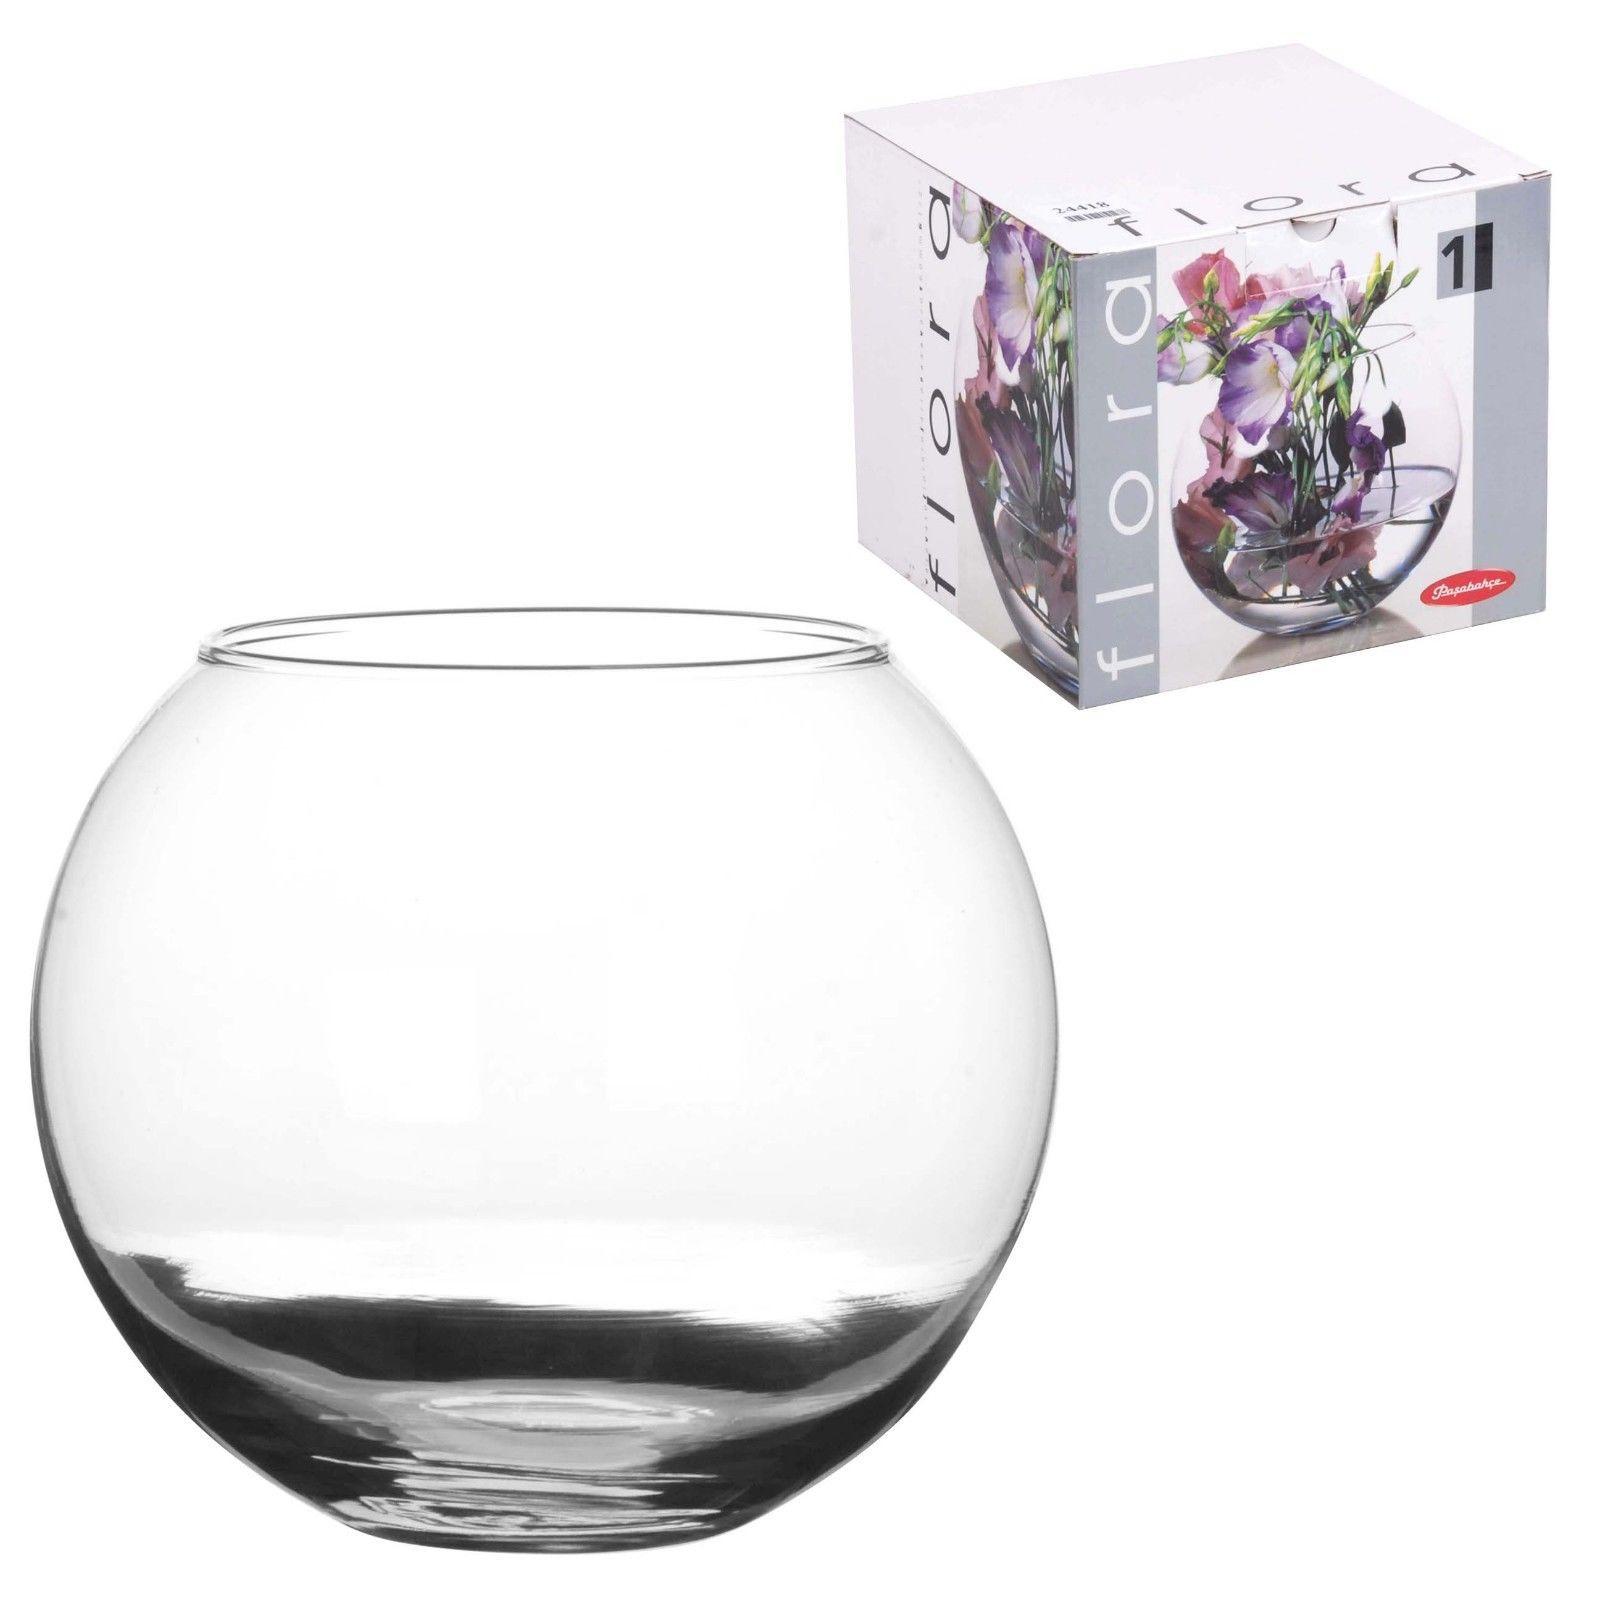 vintage glass vases ebay of pasabahce botanica bowl 45068 ebay pertaining to norton secured powered by verisign